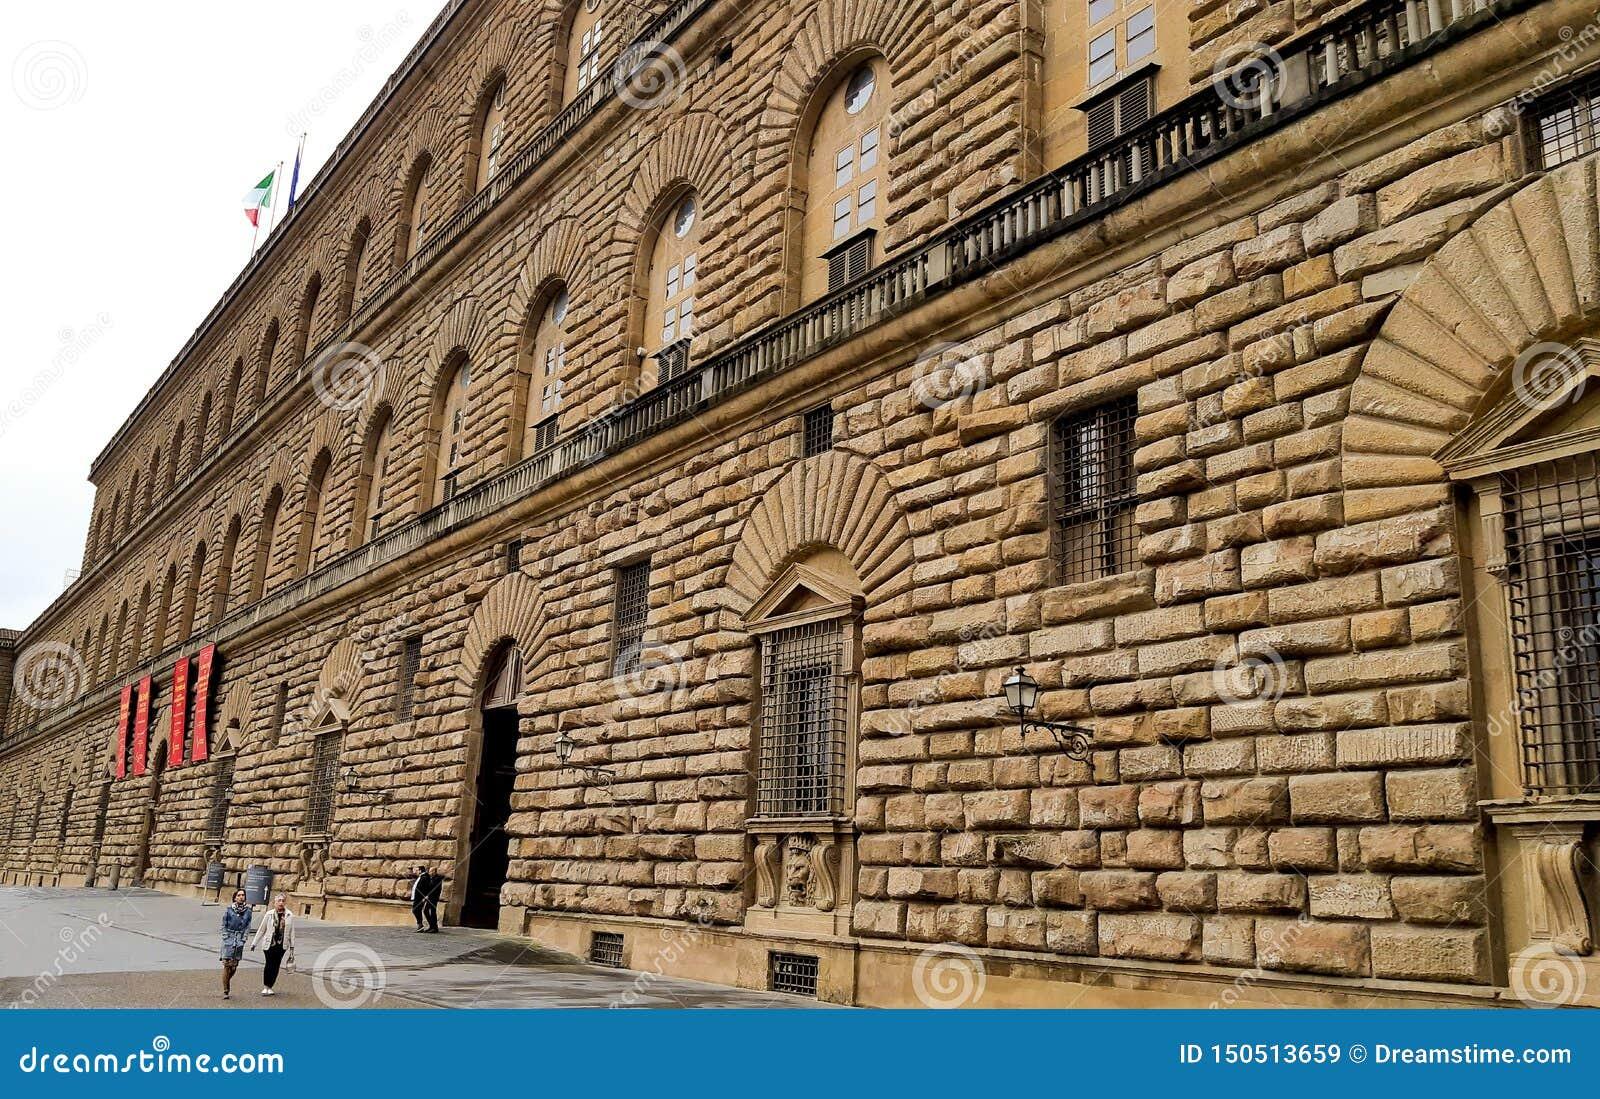 宫殿佛罗伦萨意大利欧洲architecturethe博物馆